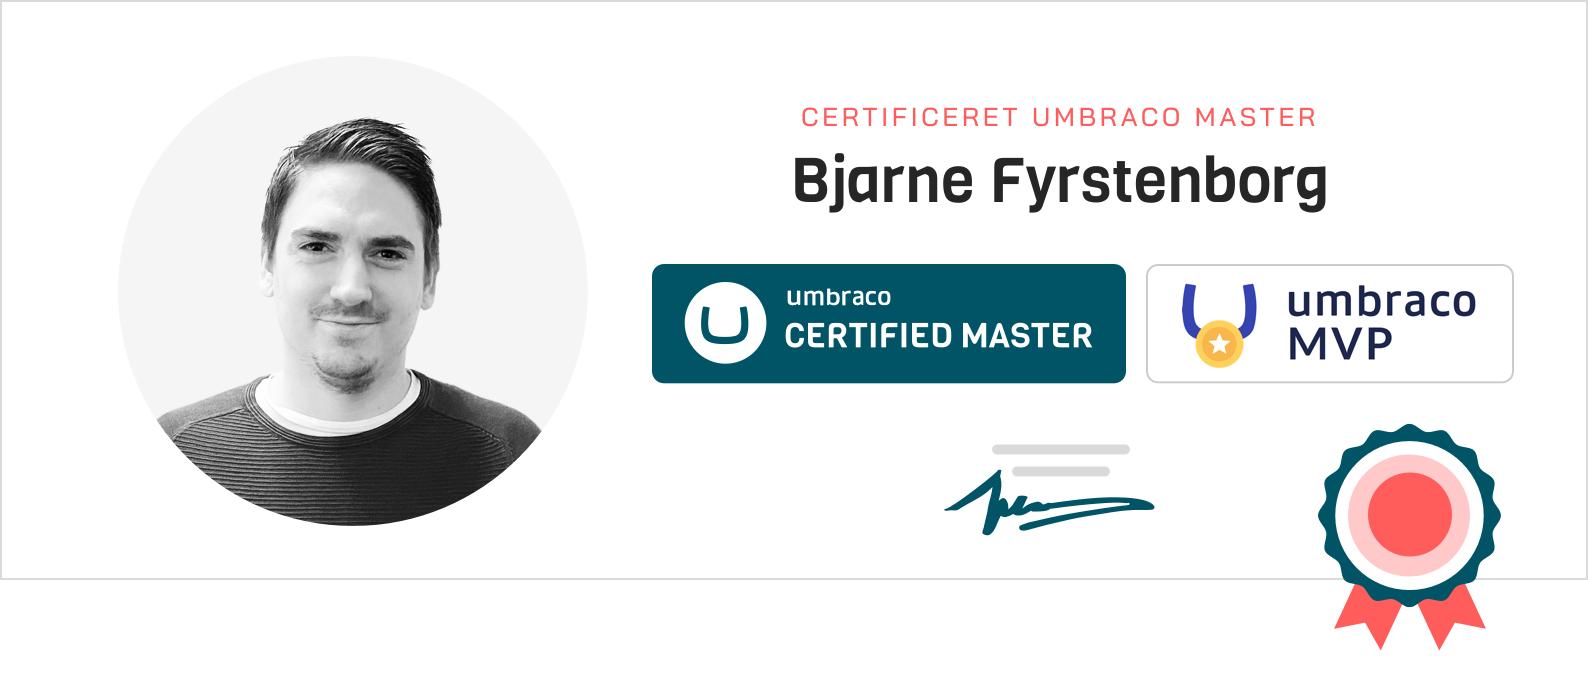 certified_umbracomaster_bjarne02-1